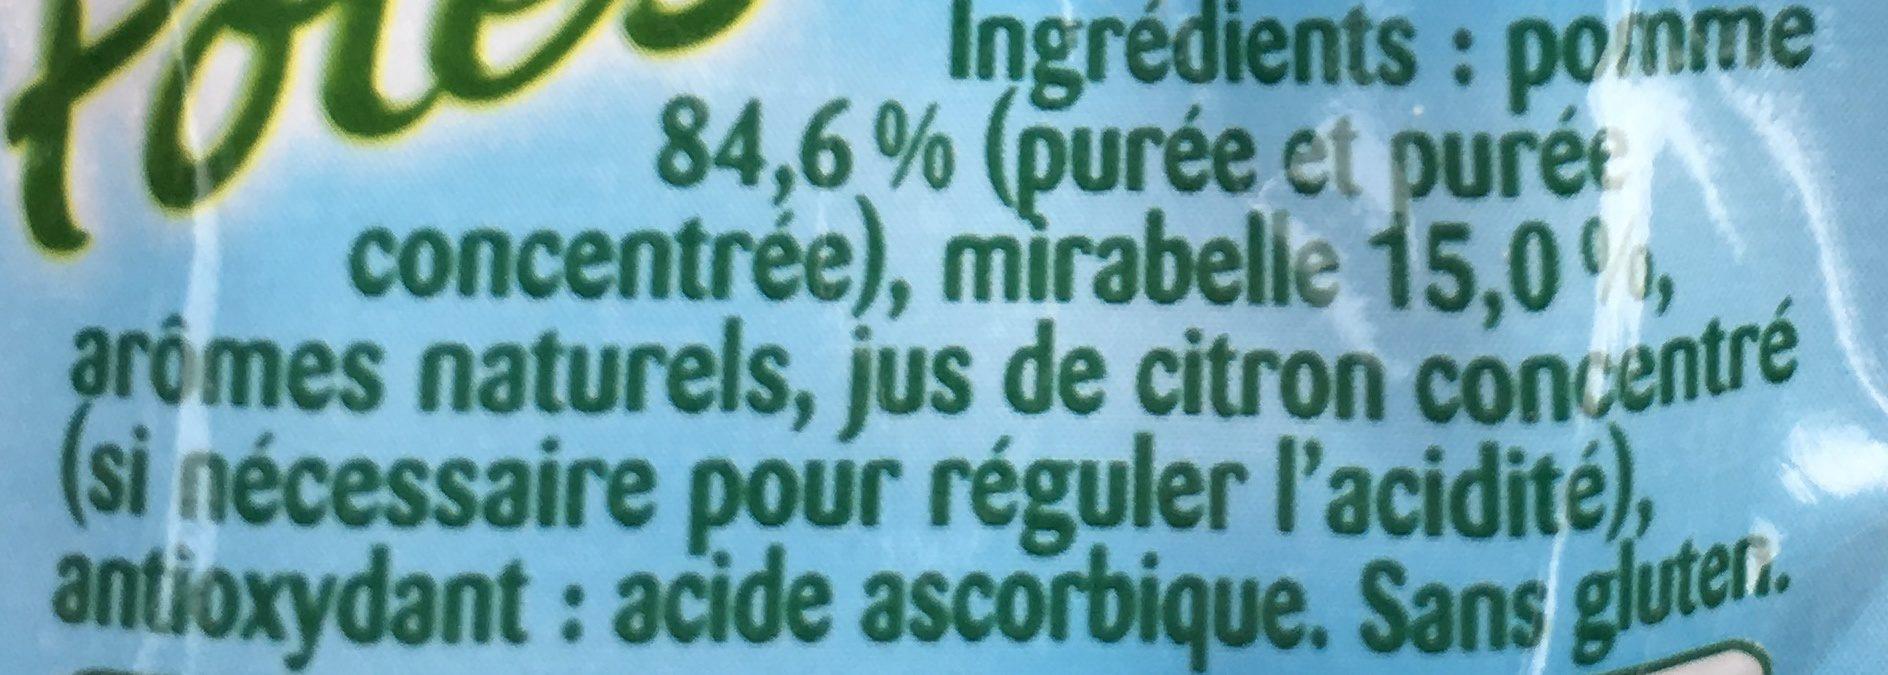 Pom'Potes Pomme Mirabelle - Ingredients